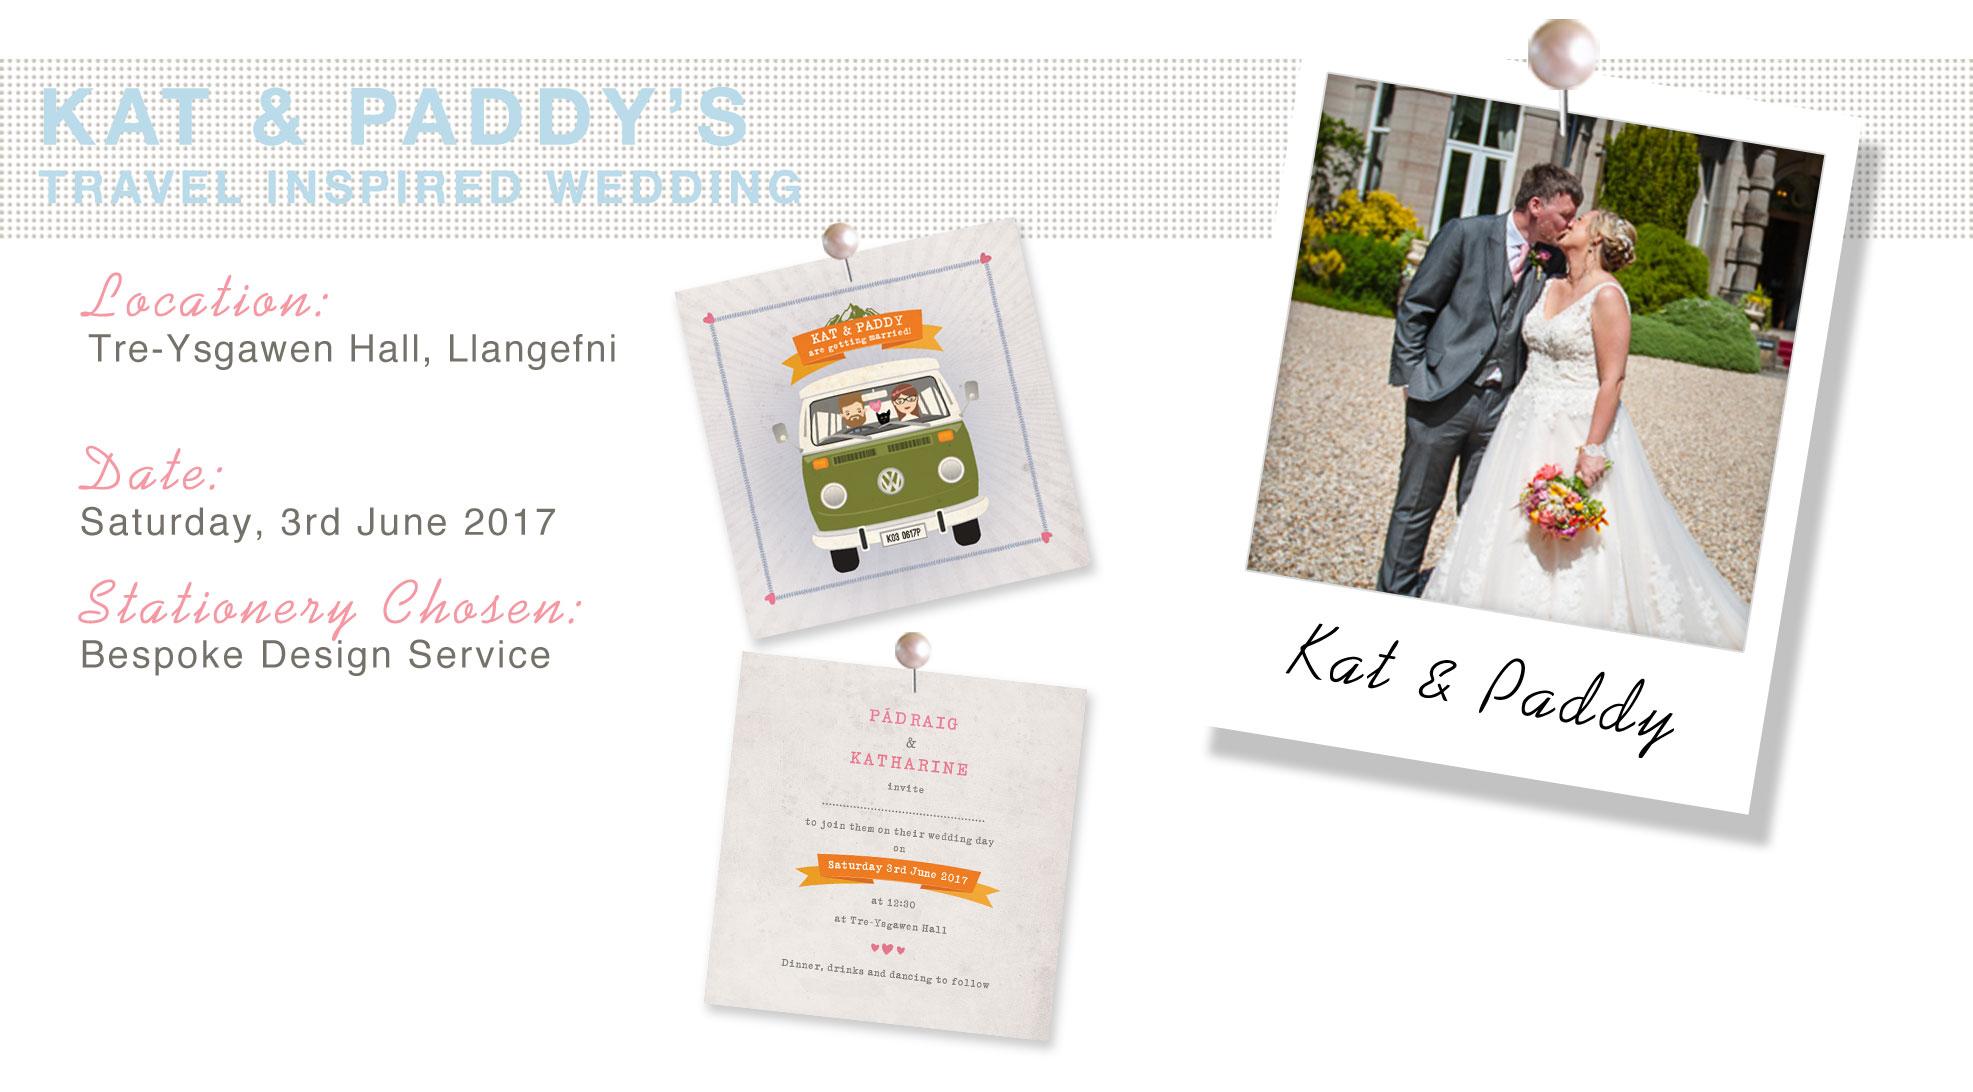 Kat & Paddy's Wedding